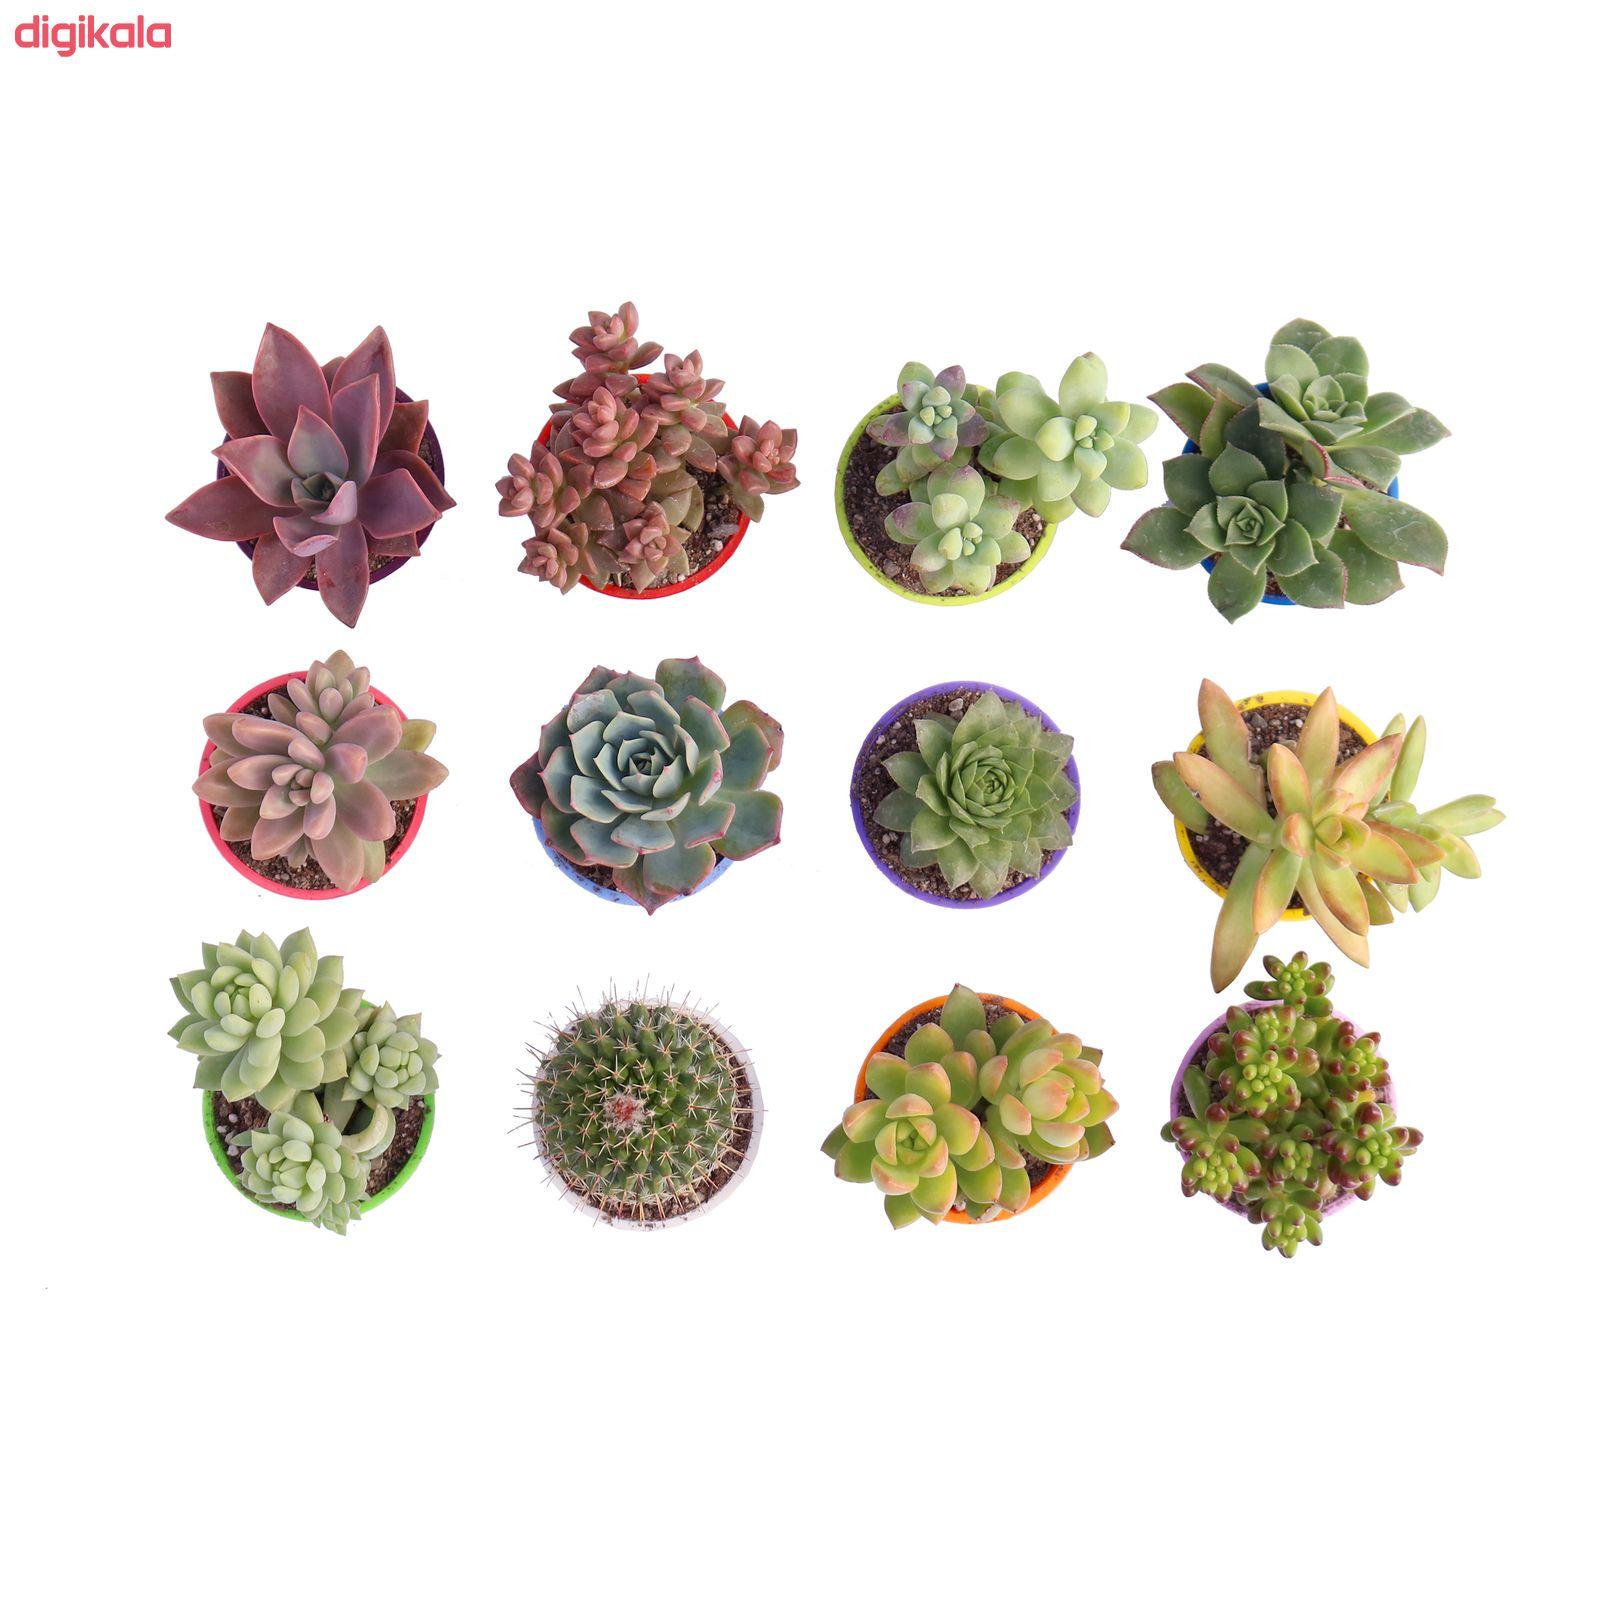 گیاه طبیعی کاکتوس و ساکولنت آیدین کاکتوس کد CB-009 بسته 12 عددی main 1 3